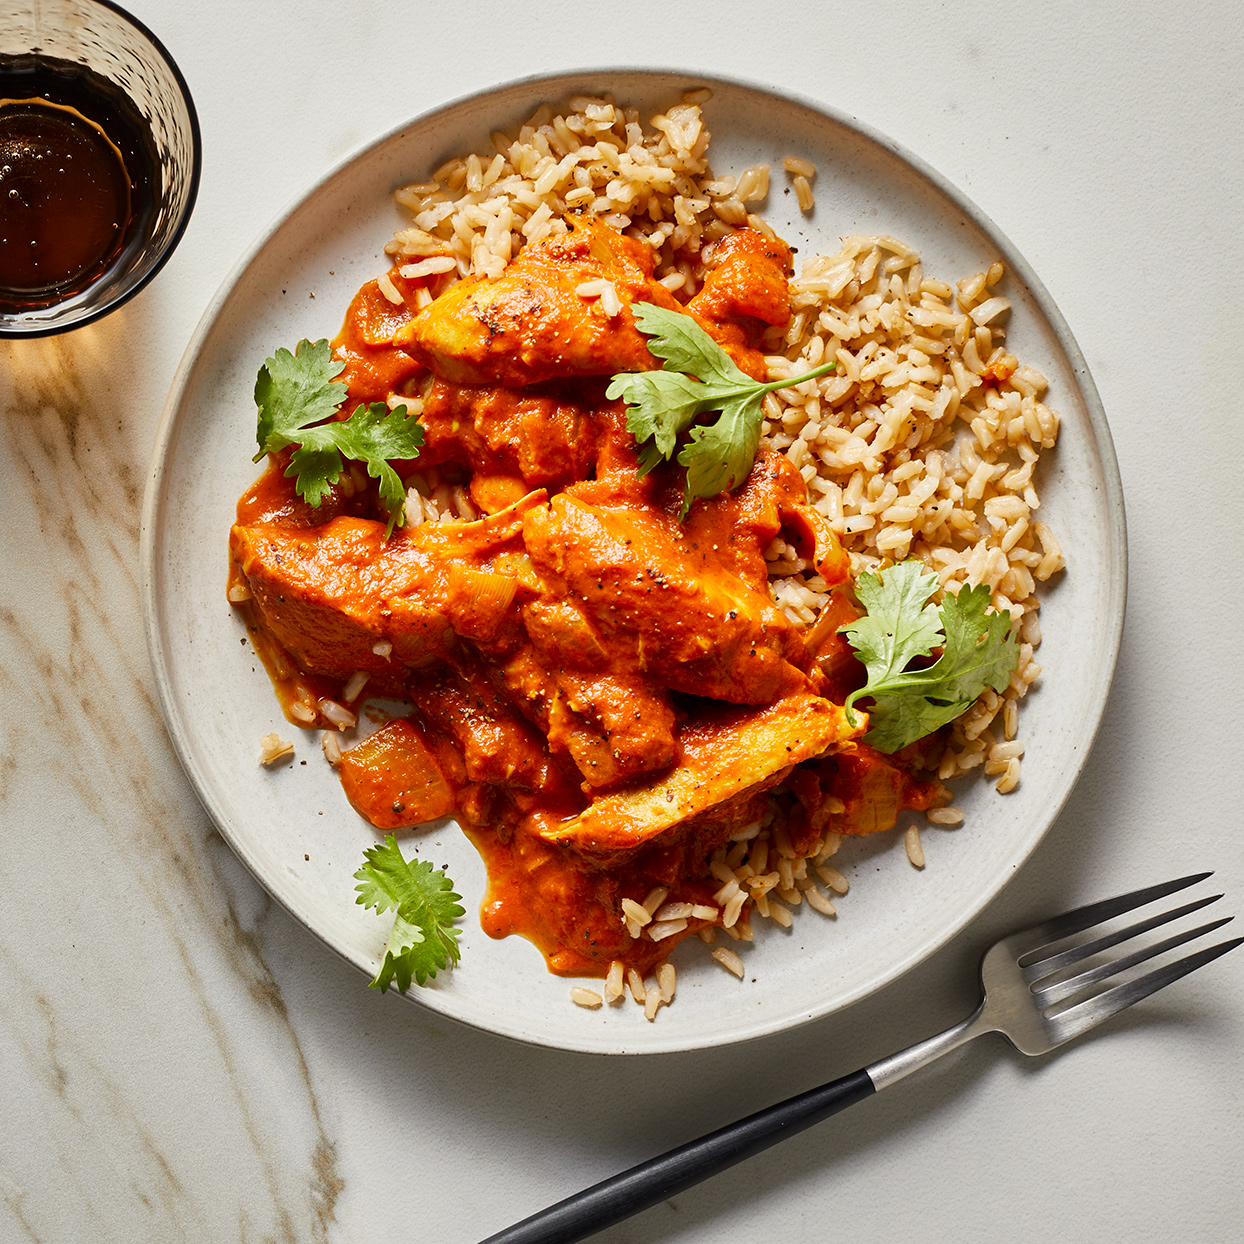 Healthy Chicken & Rice Recipes